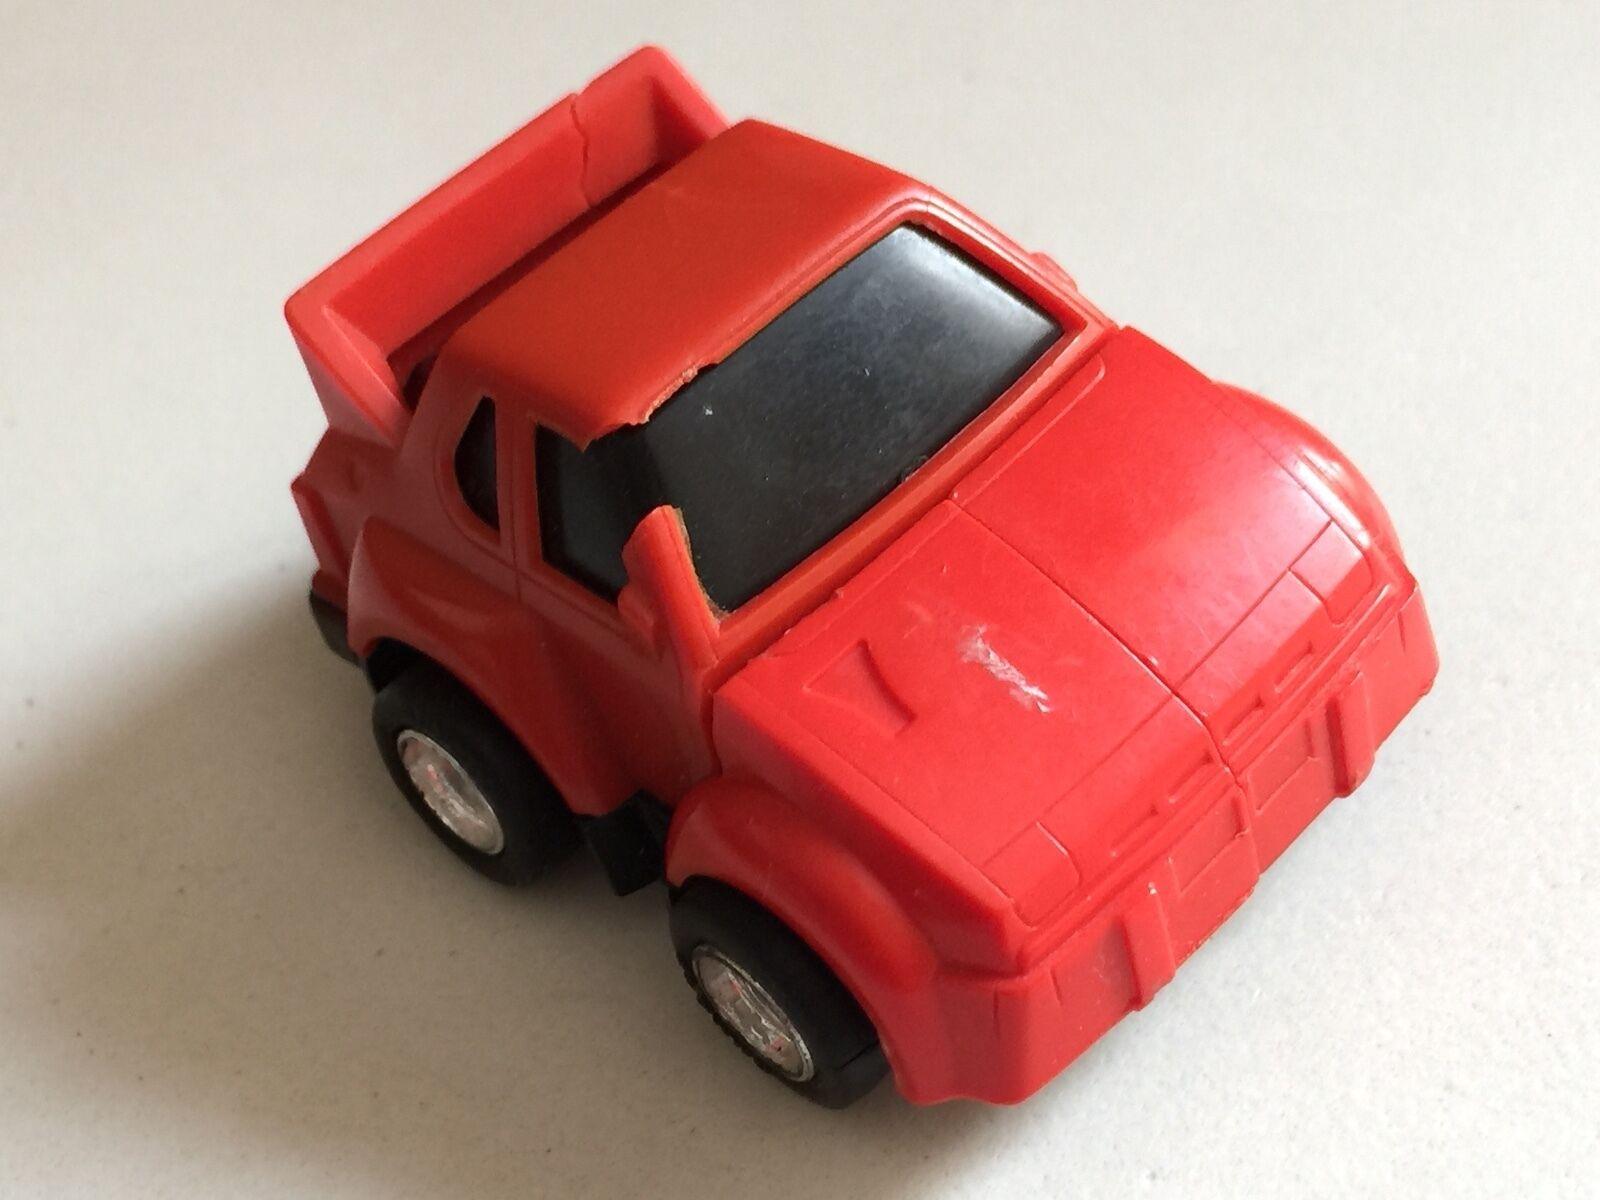 Transformers G1 1985 rot CLIFFJUMPER IGA (damage) (mexican) hasbro takara